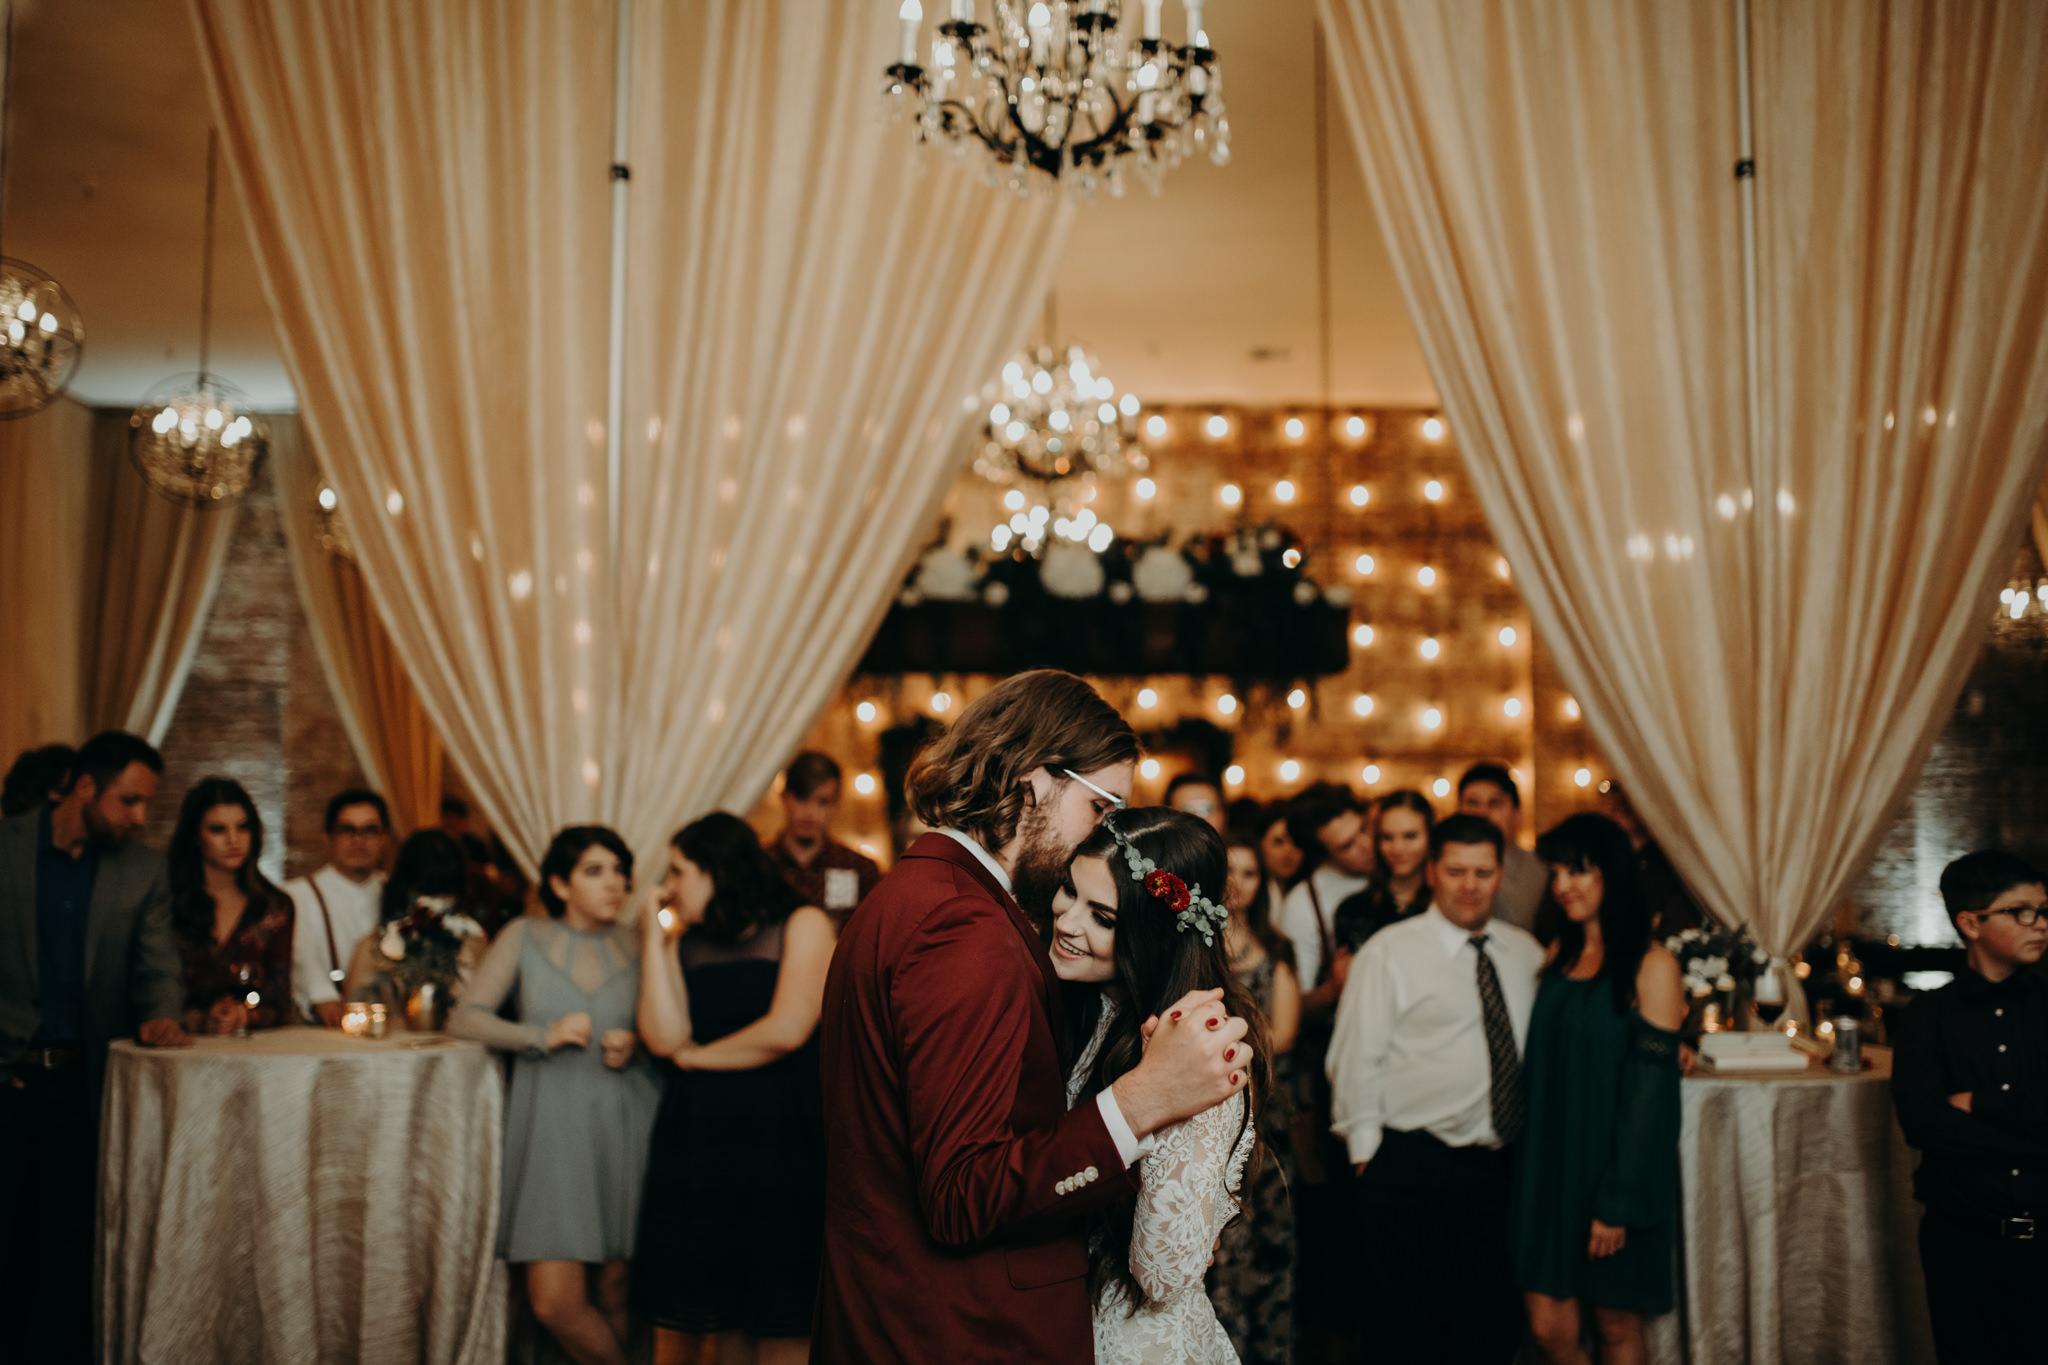 couple-wedding-indie-wedding-northern-california-133.jpg